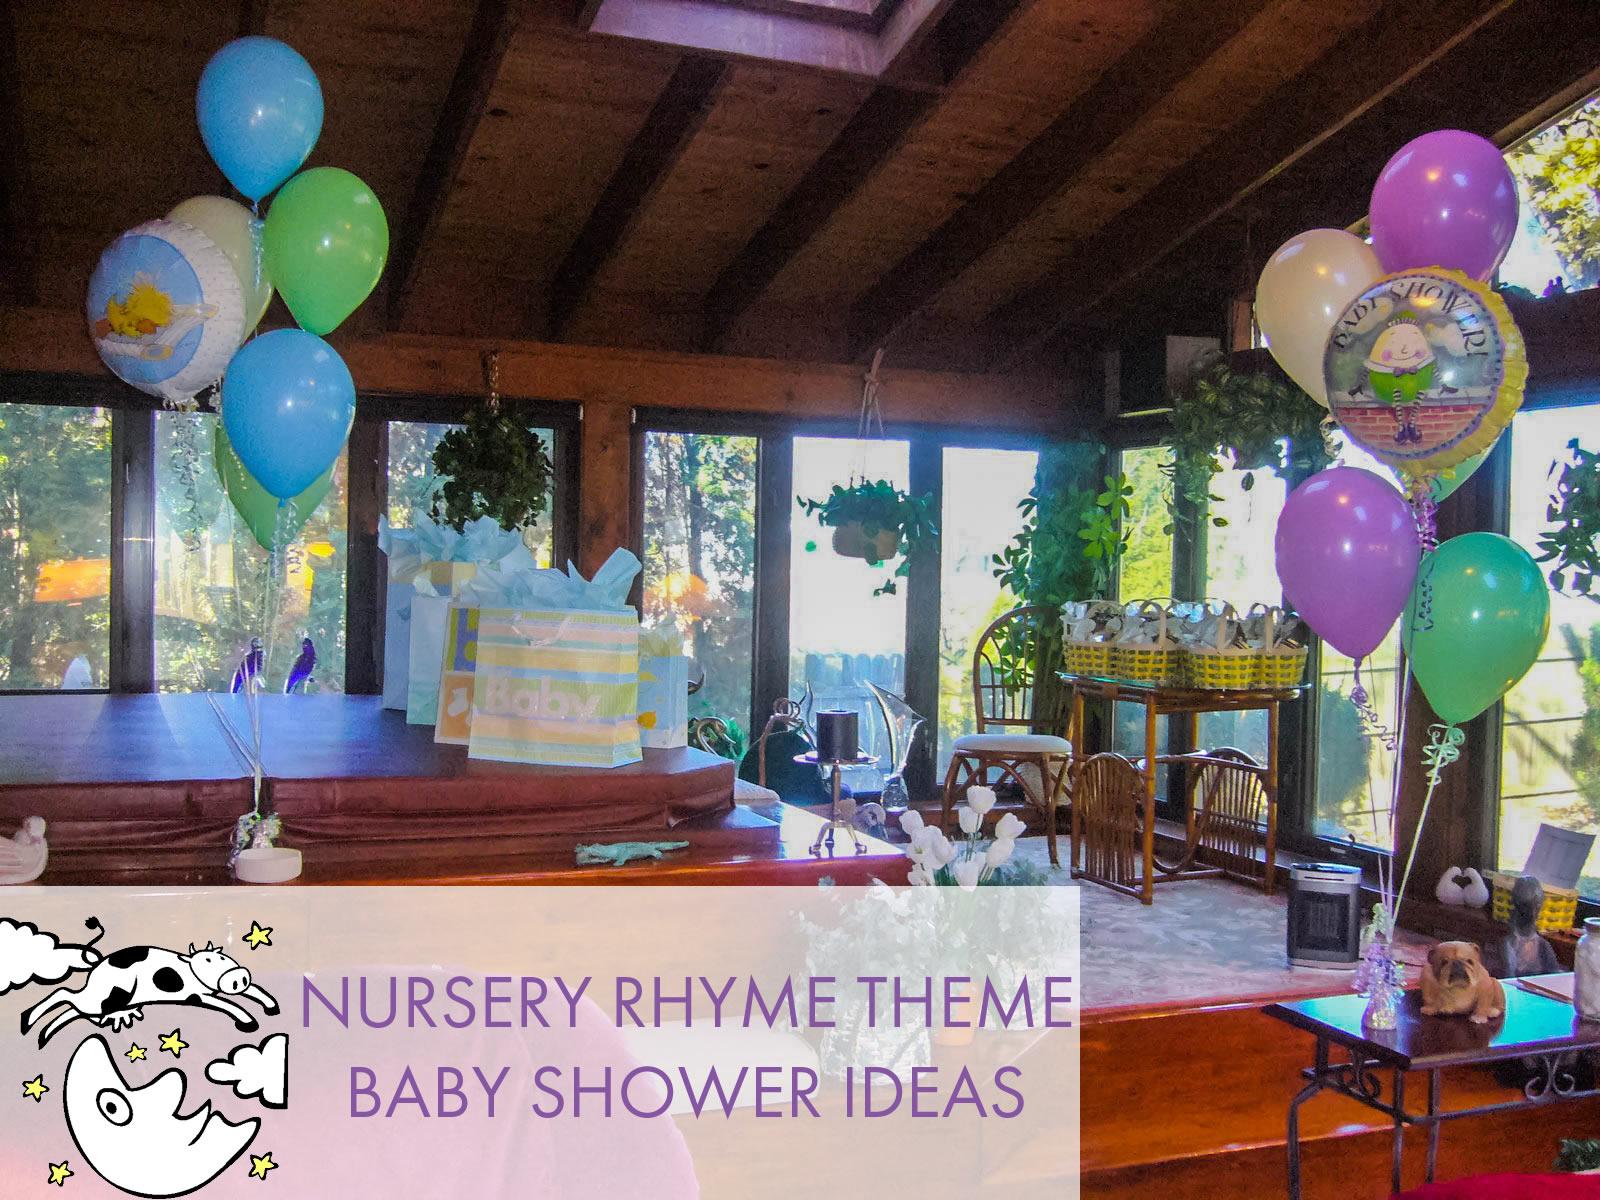 Nursery Rhyme Baby Shower Theme Ideas & Inspiration | The Sendo Blog